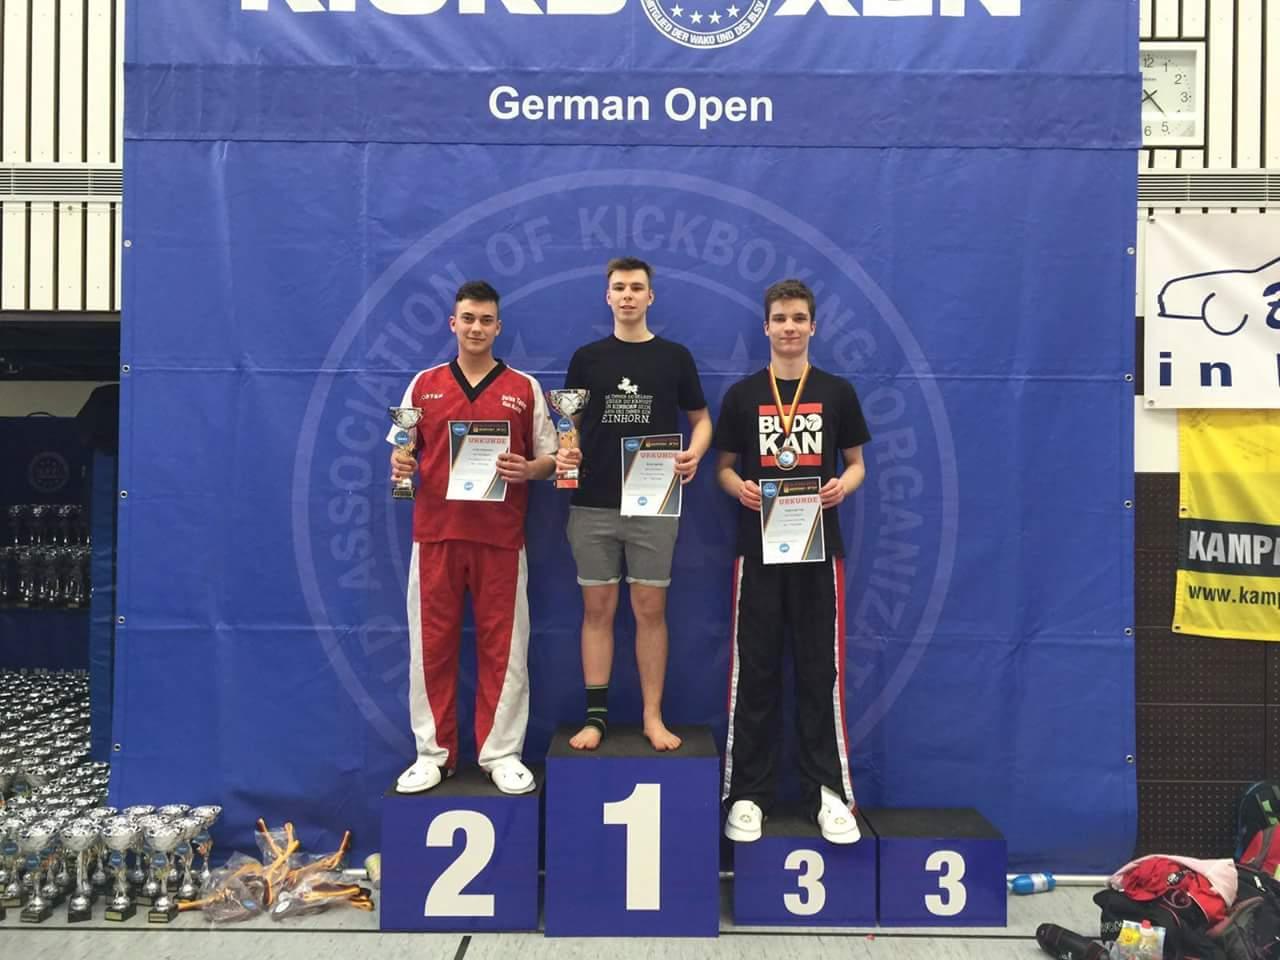 52_Alessandro@German Open16